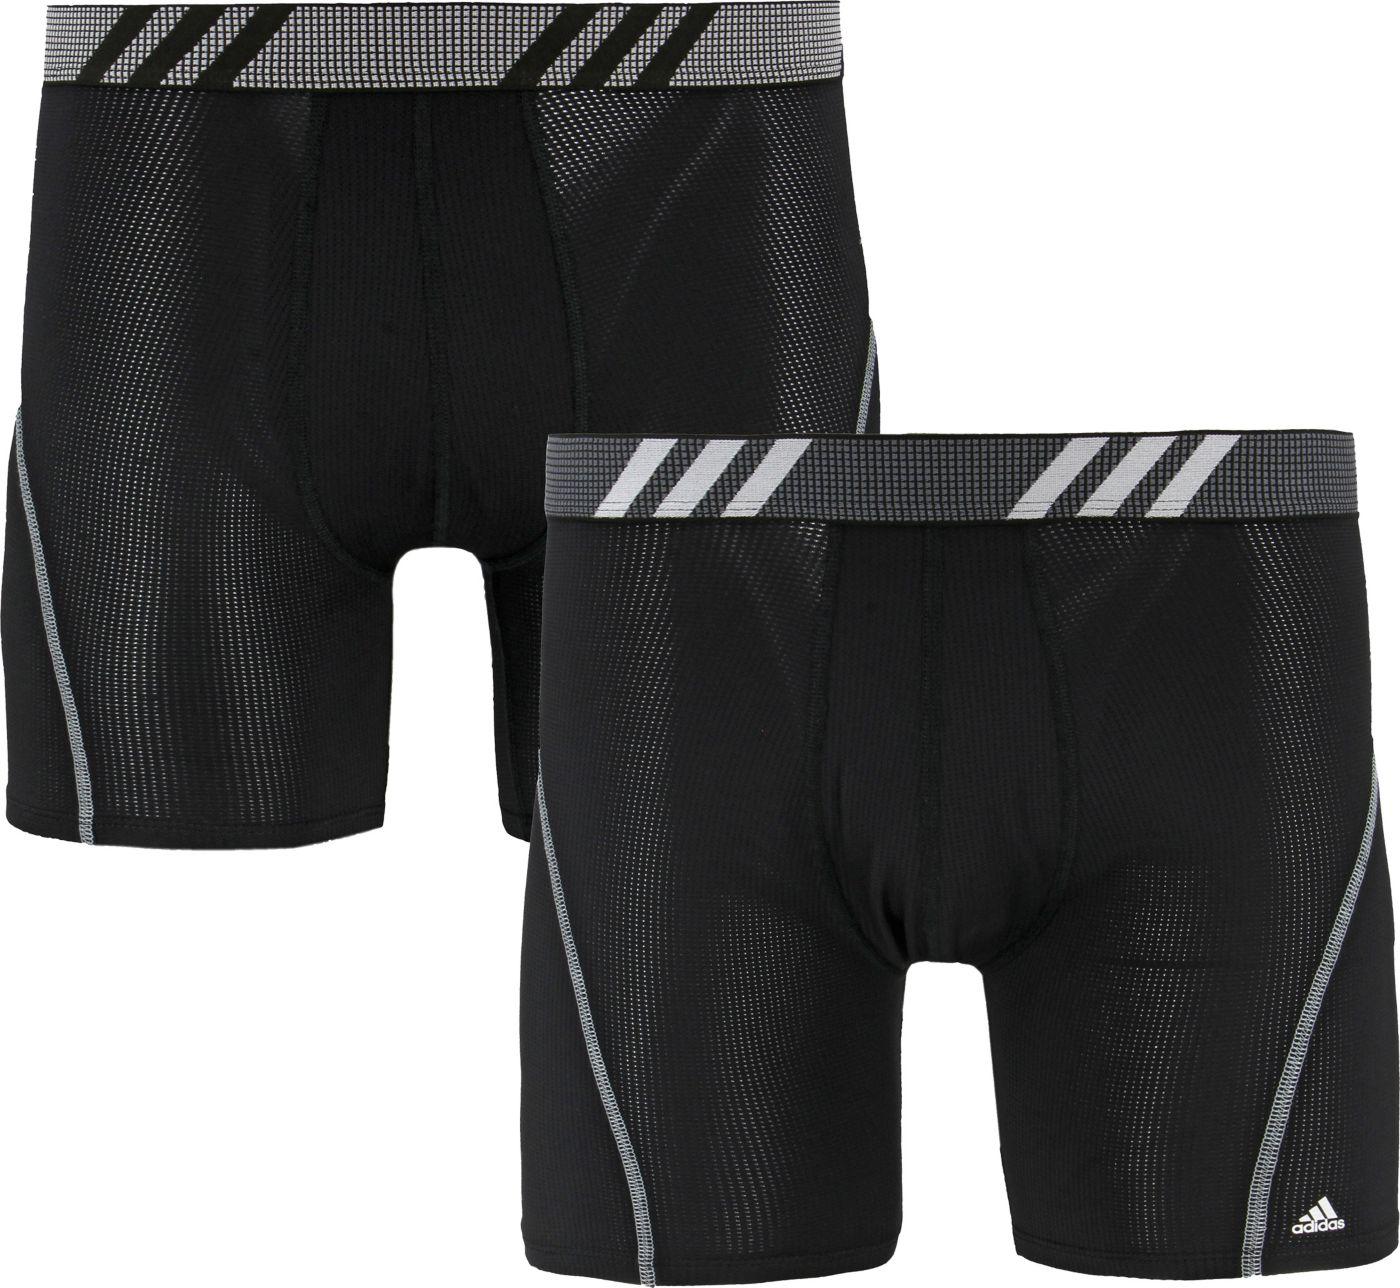 adidas Men's Sport Performance Mesh Boxer Briefs – 2 Pack